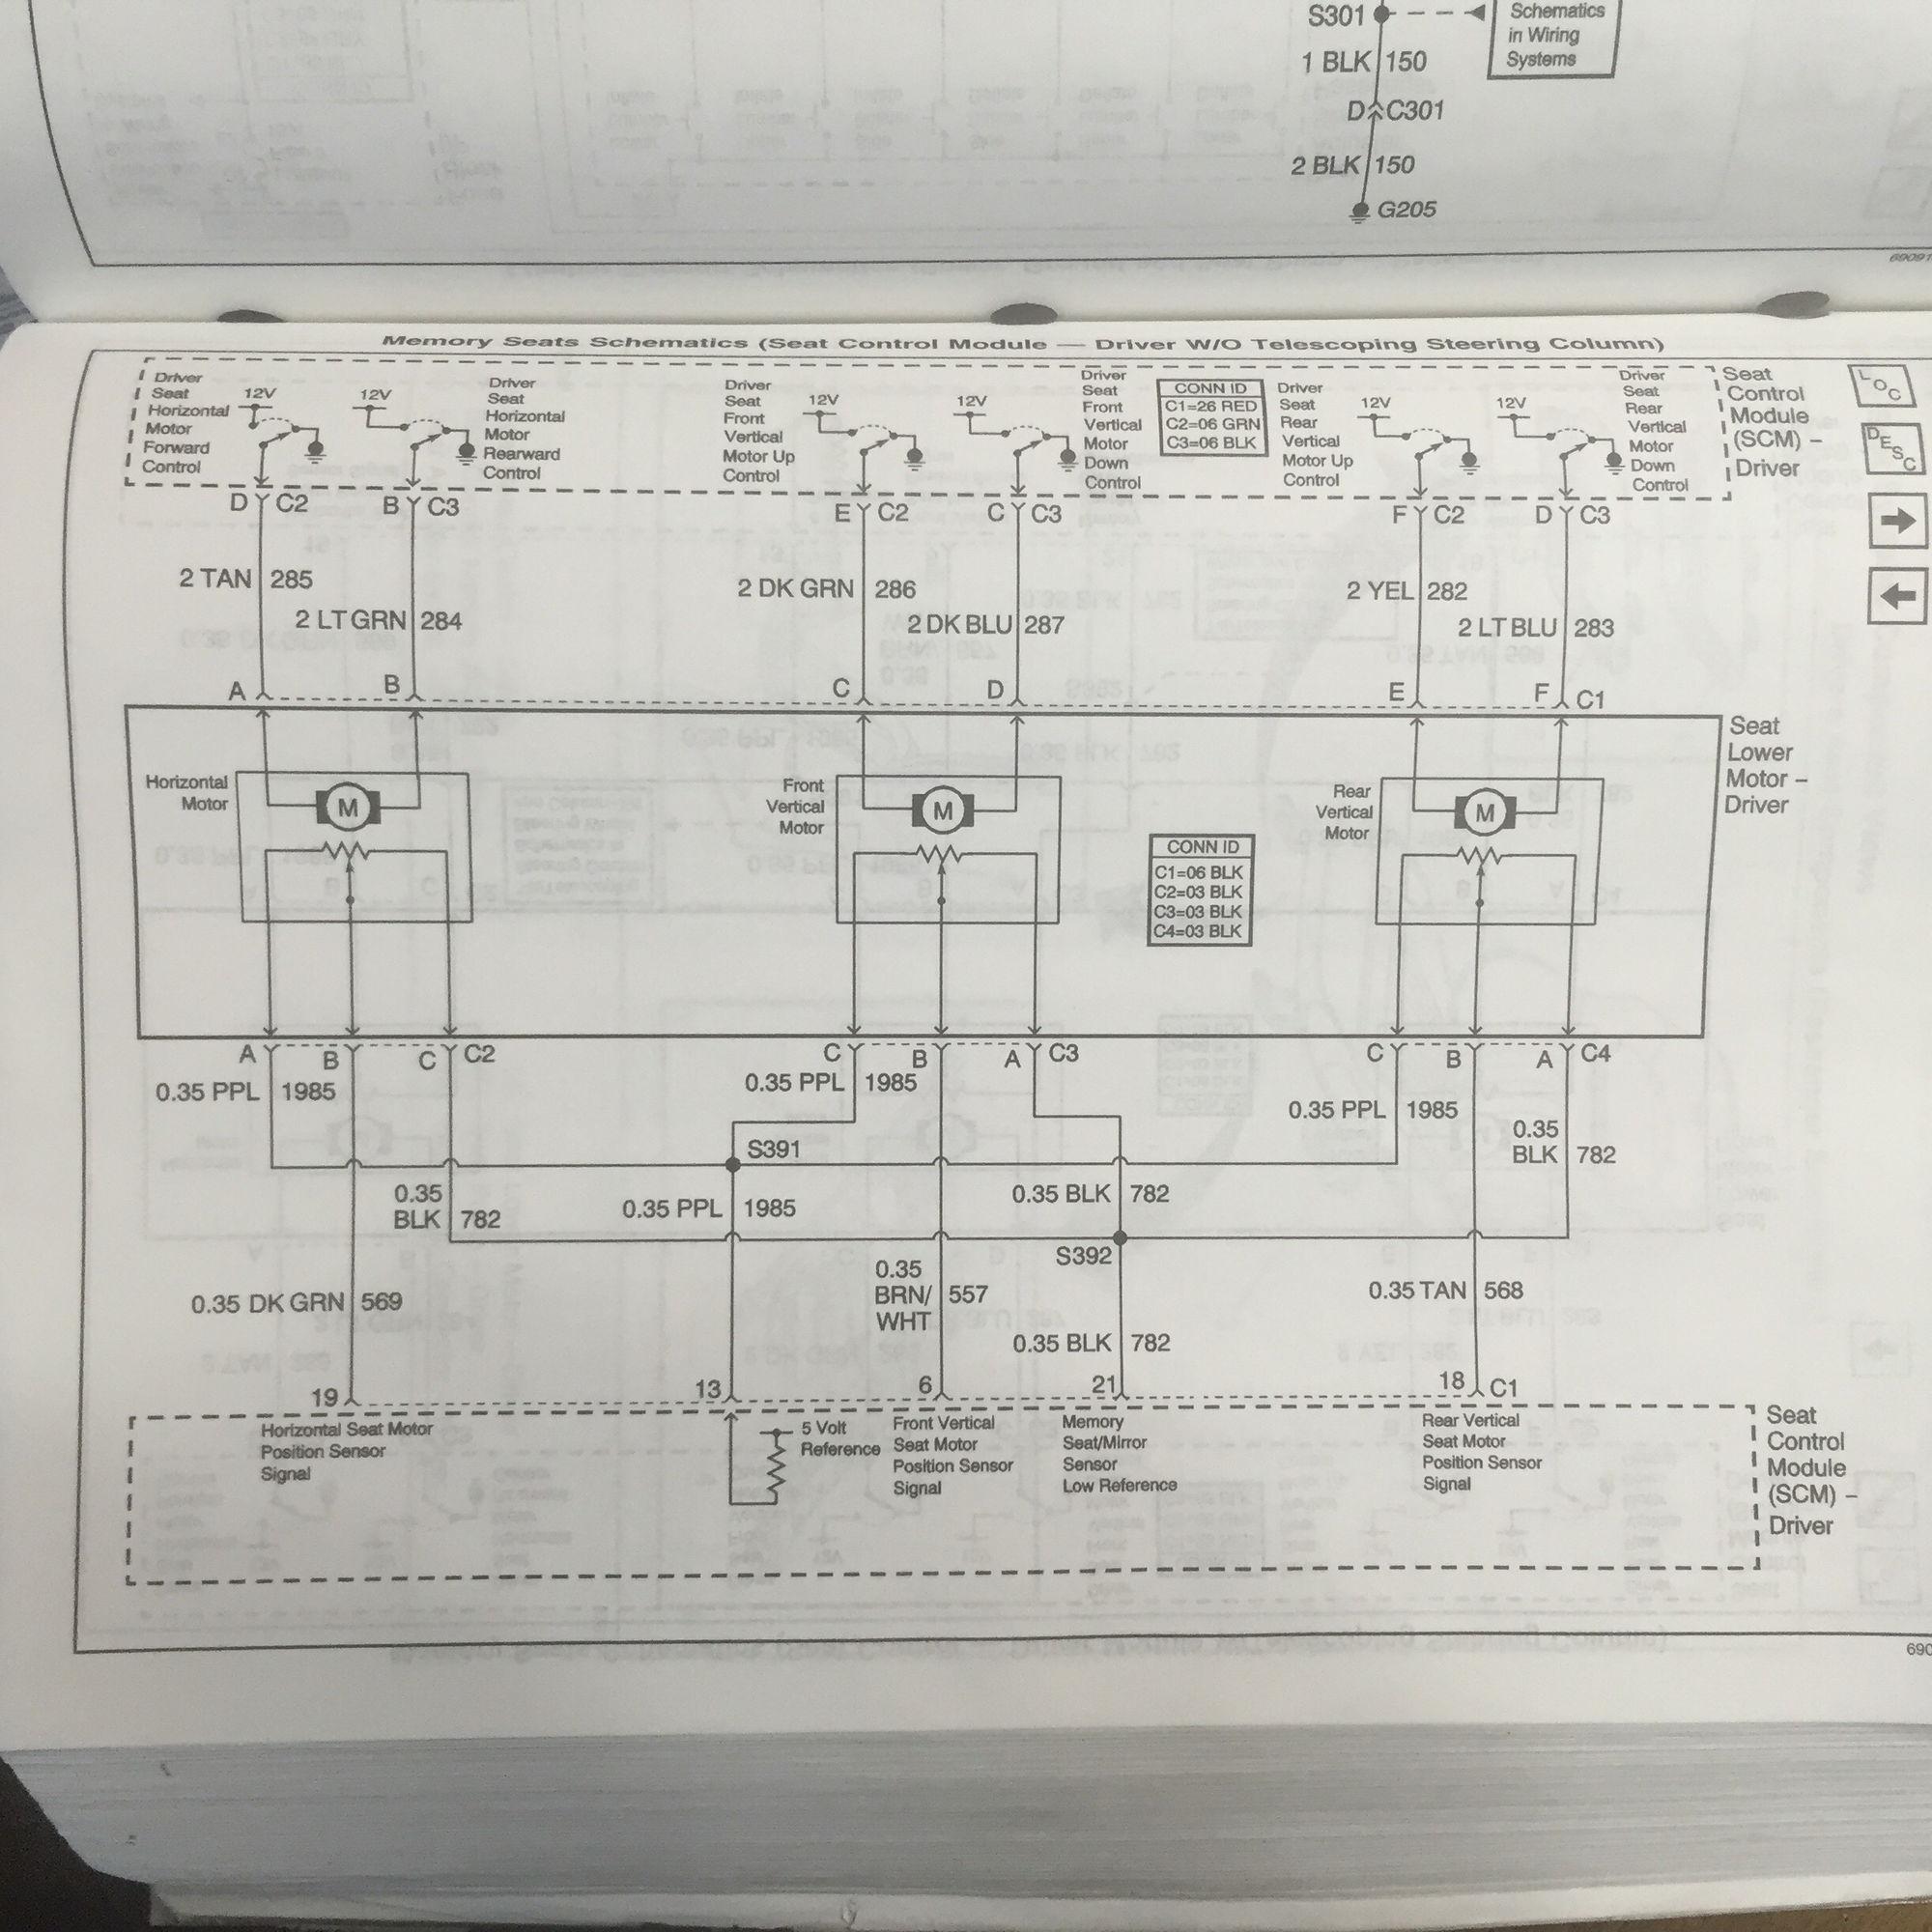 c5 corvette power seat wiring diagram 2000 ford explorer parts corvetteforum chevrolet